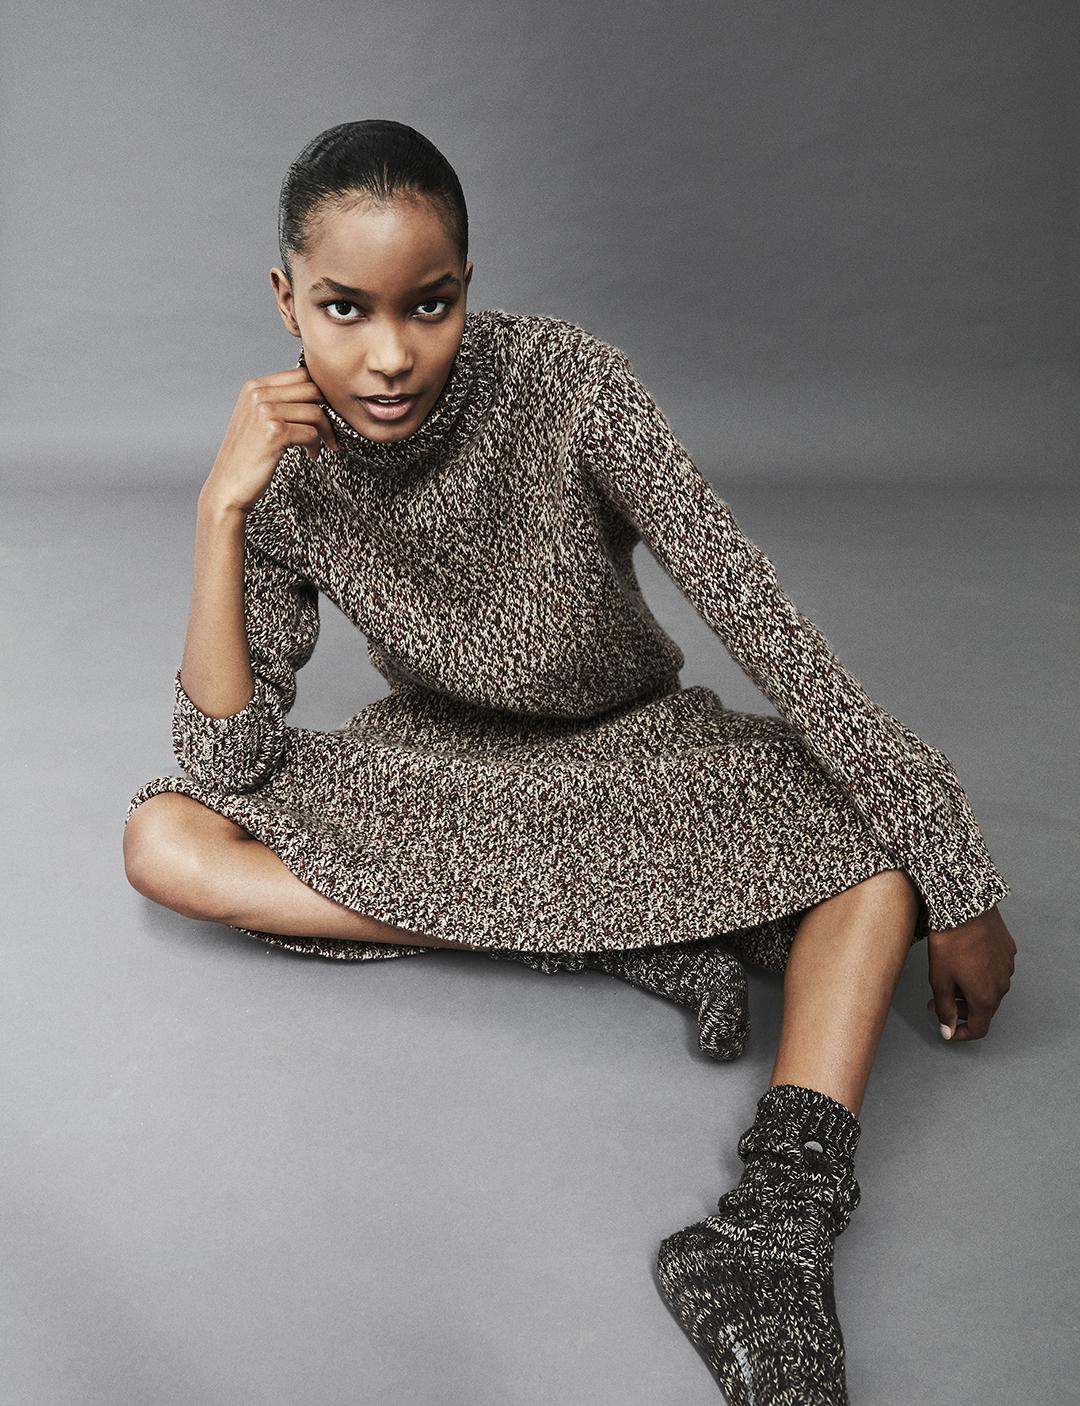 Elle - Elle Spain - Fashion - Editorial -  Rafa Gallar - 8AM - 8 Artist Management